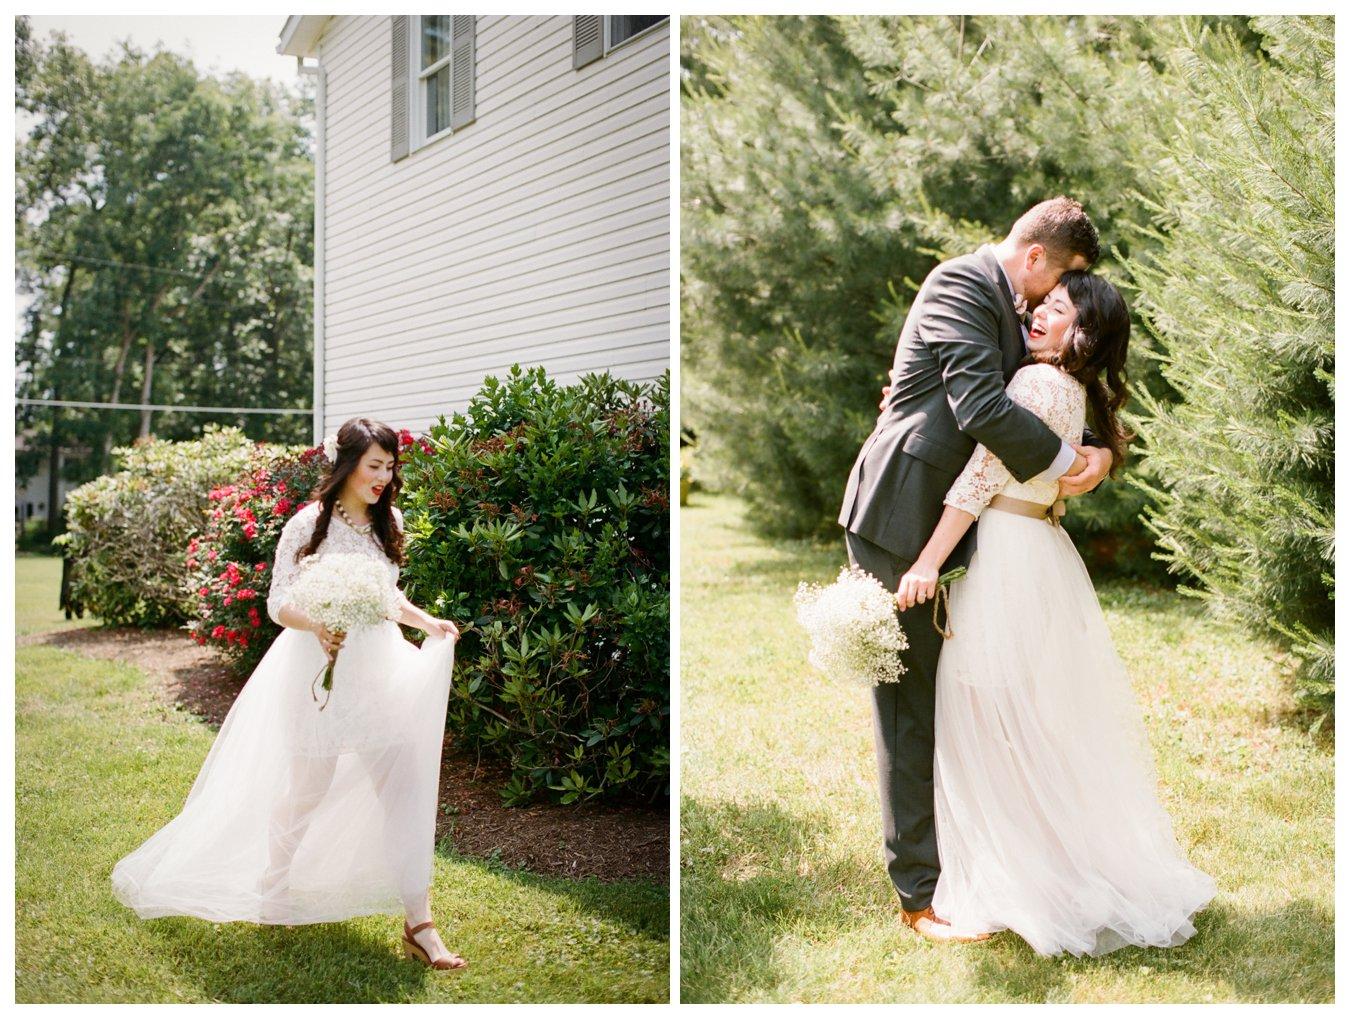 Fine Art Film wedding photographer Columbus Ohio Lily Glass Photography. Madewell Wedding dress, first look